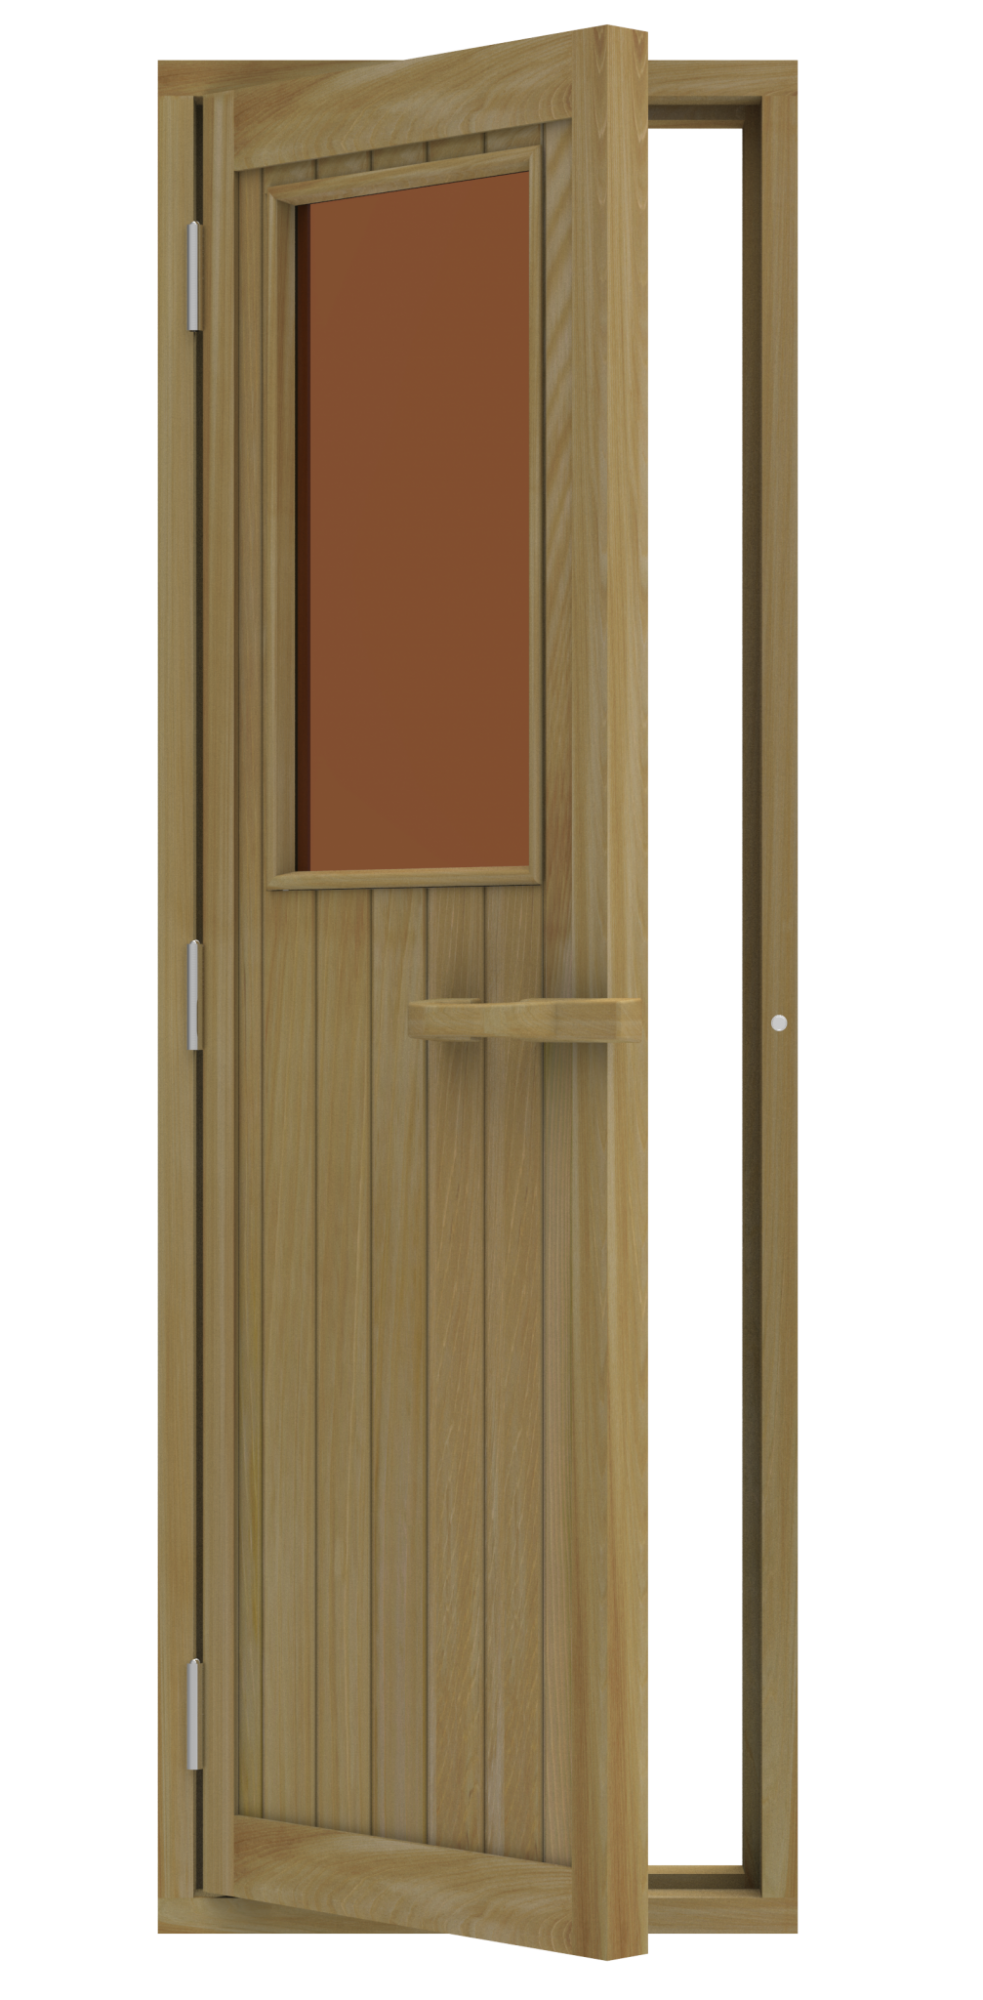 Двери: Дверь SAWO 735-4SGD-L 700 x 2040 (бронза, левая, кедр)